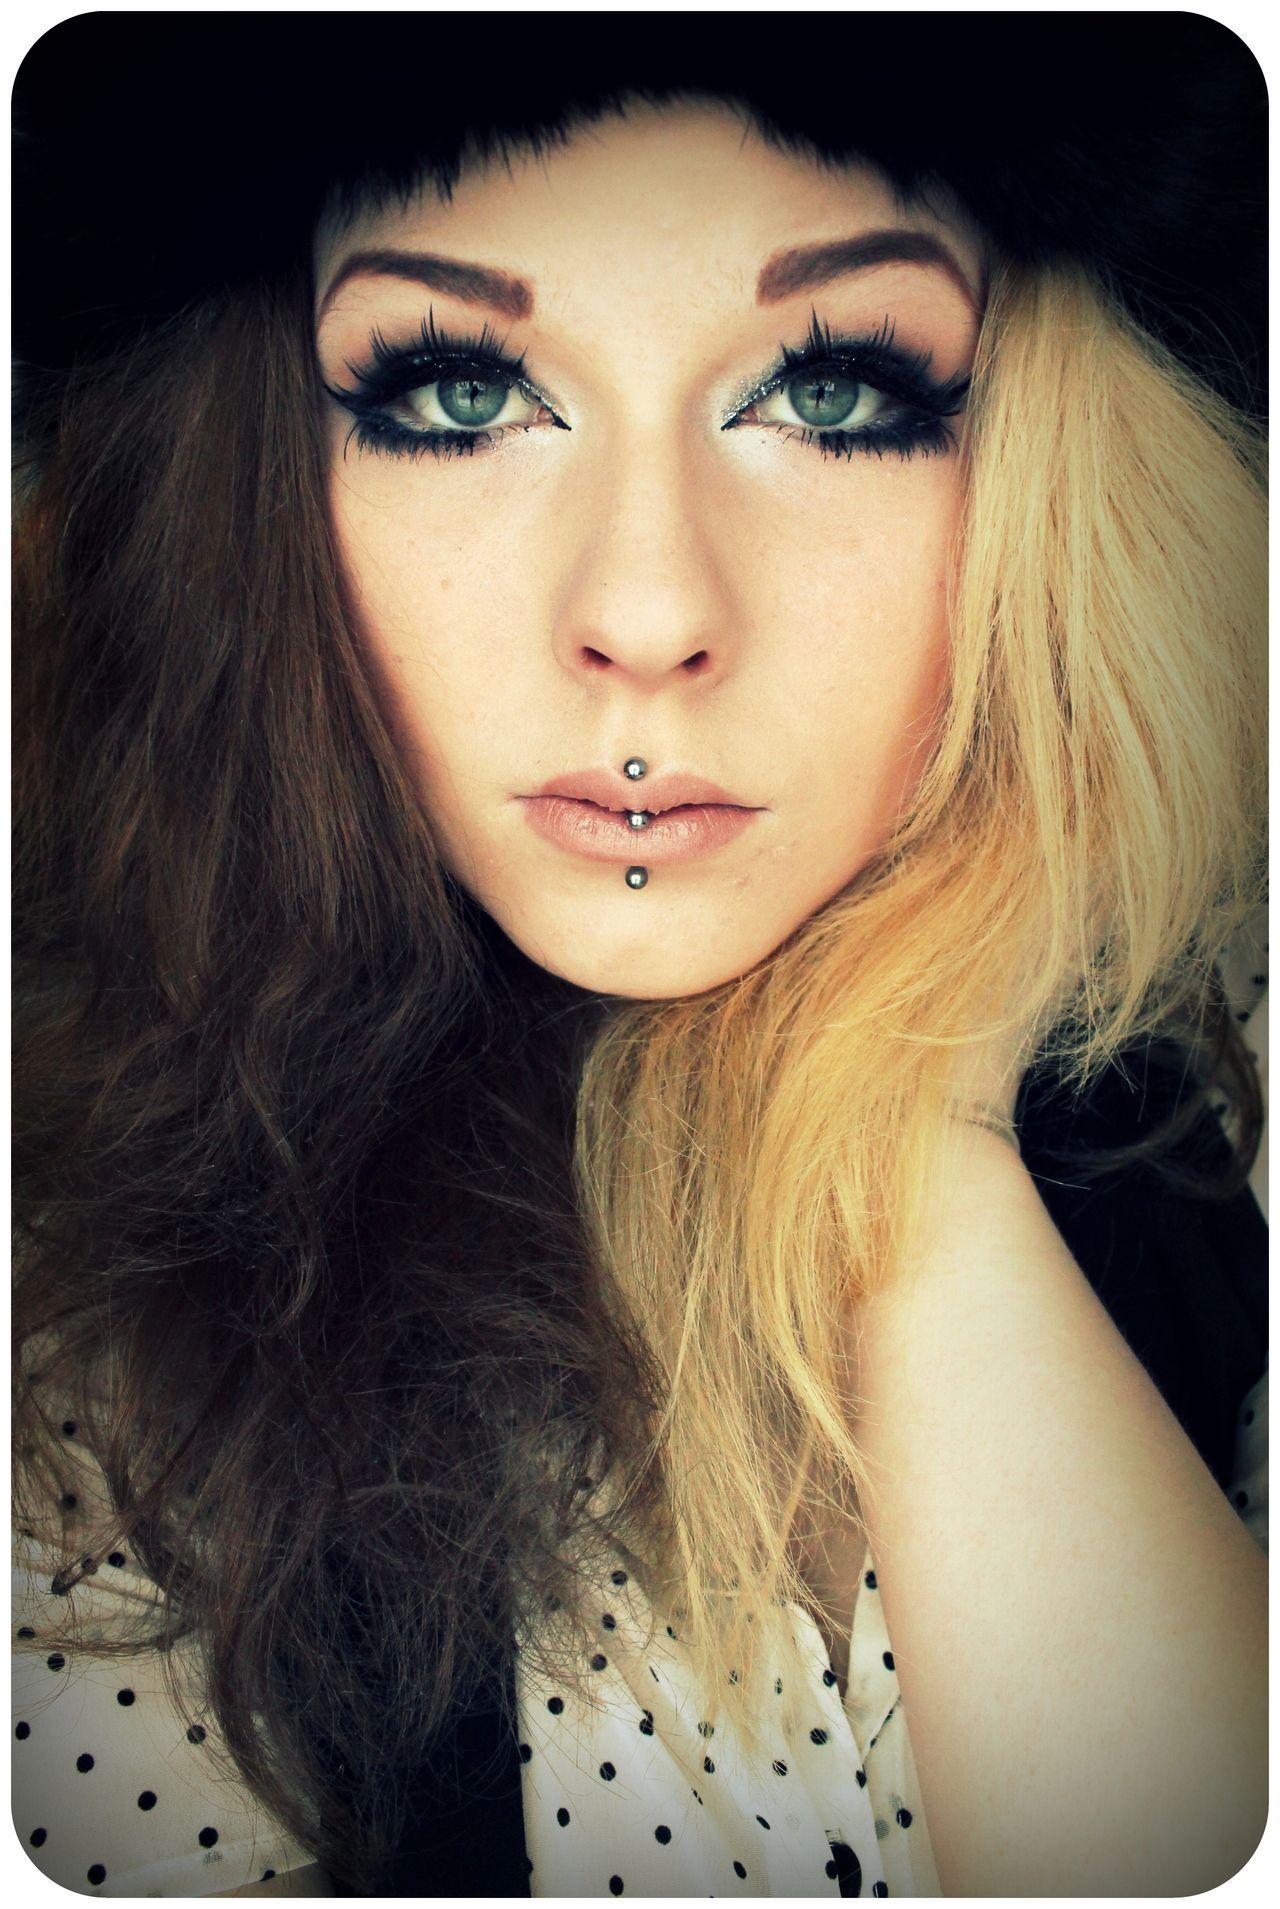 Black Half and blonde hair exclusive photo